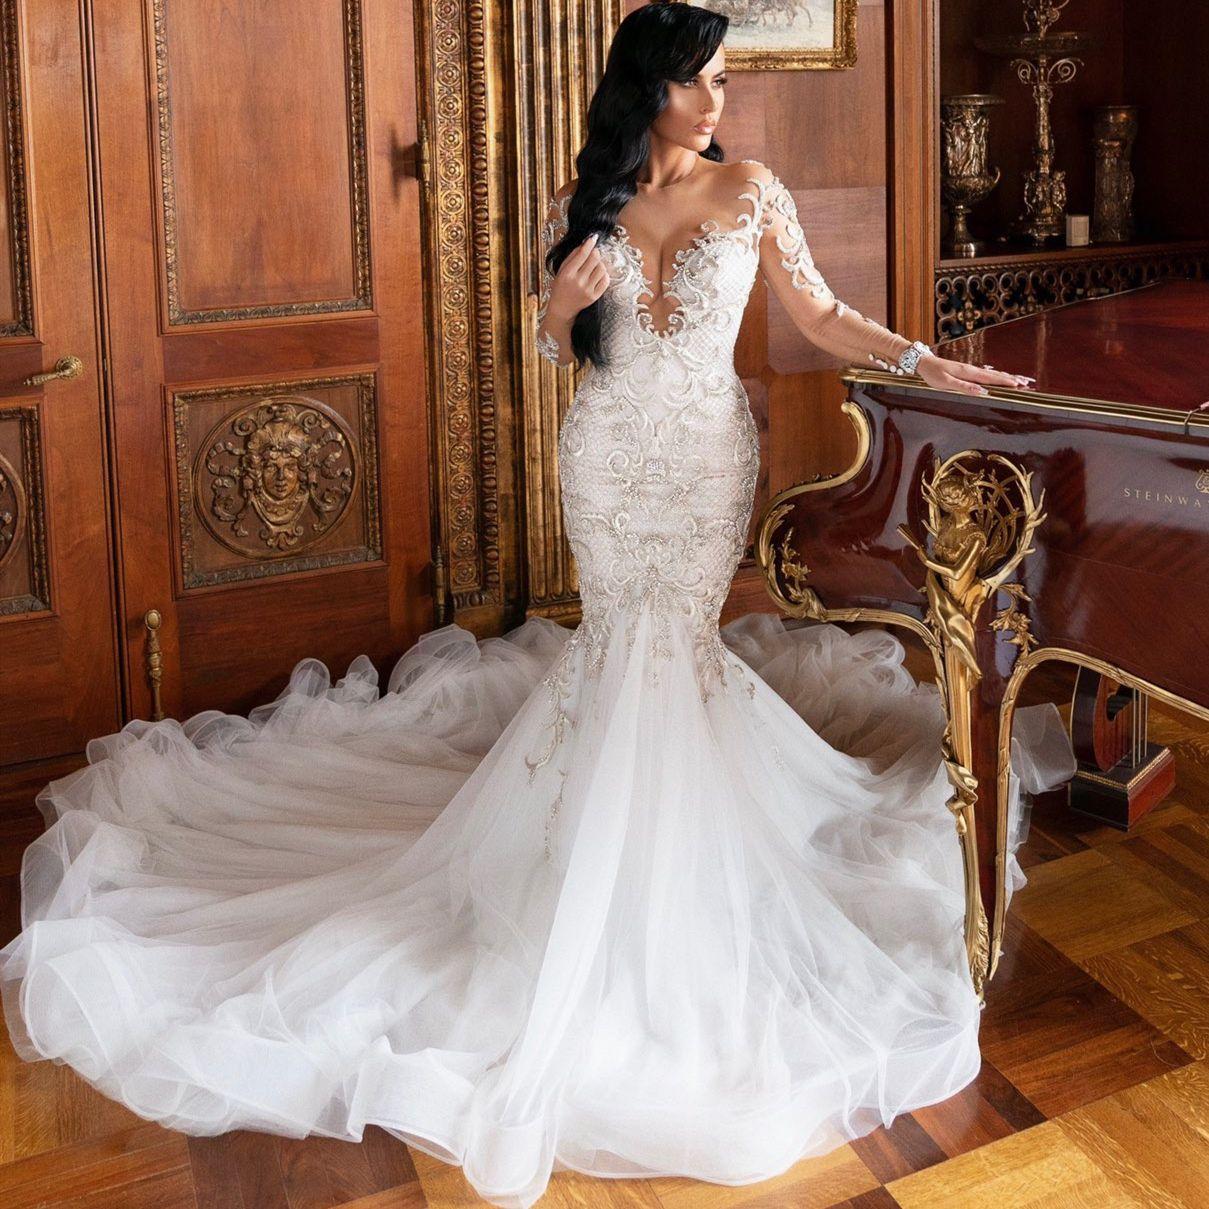 Abiti Da Sposa Sirena.Sheer Wedding Dresses Abiti Da Sposa Sirena Mermaid Jewel Neck